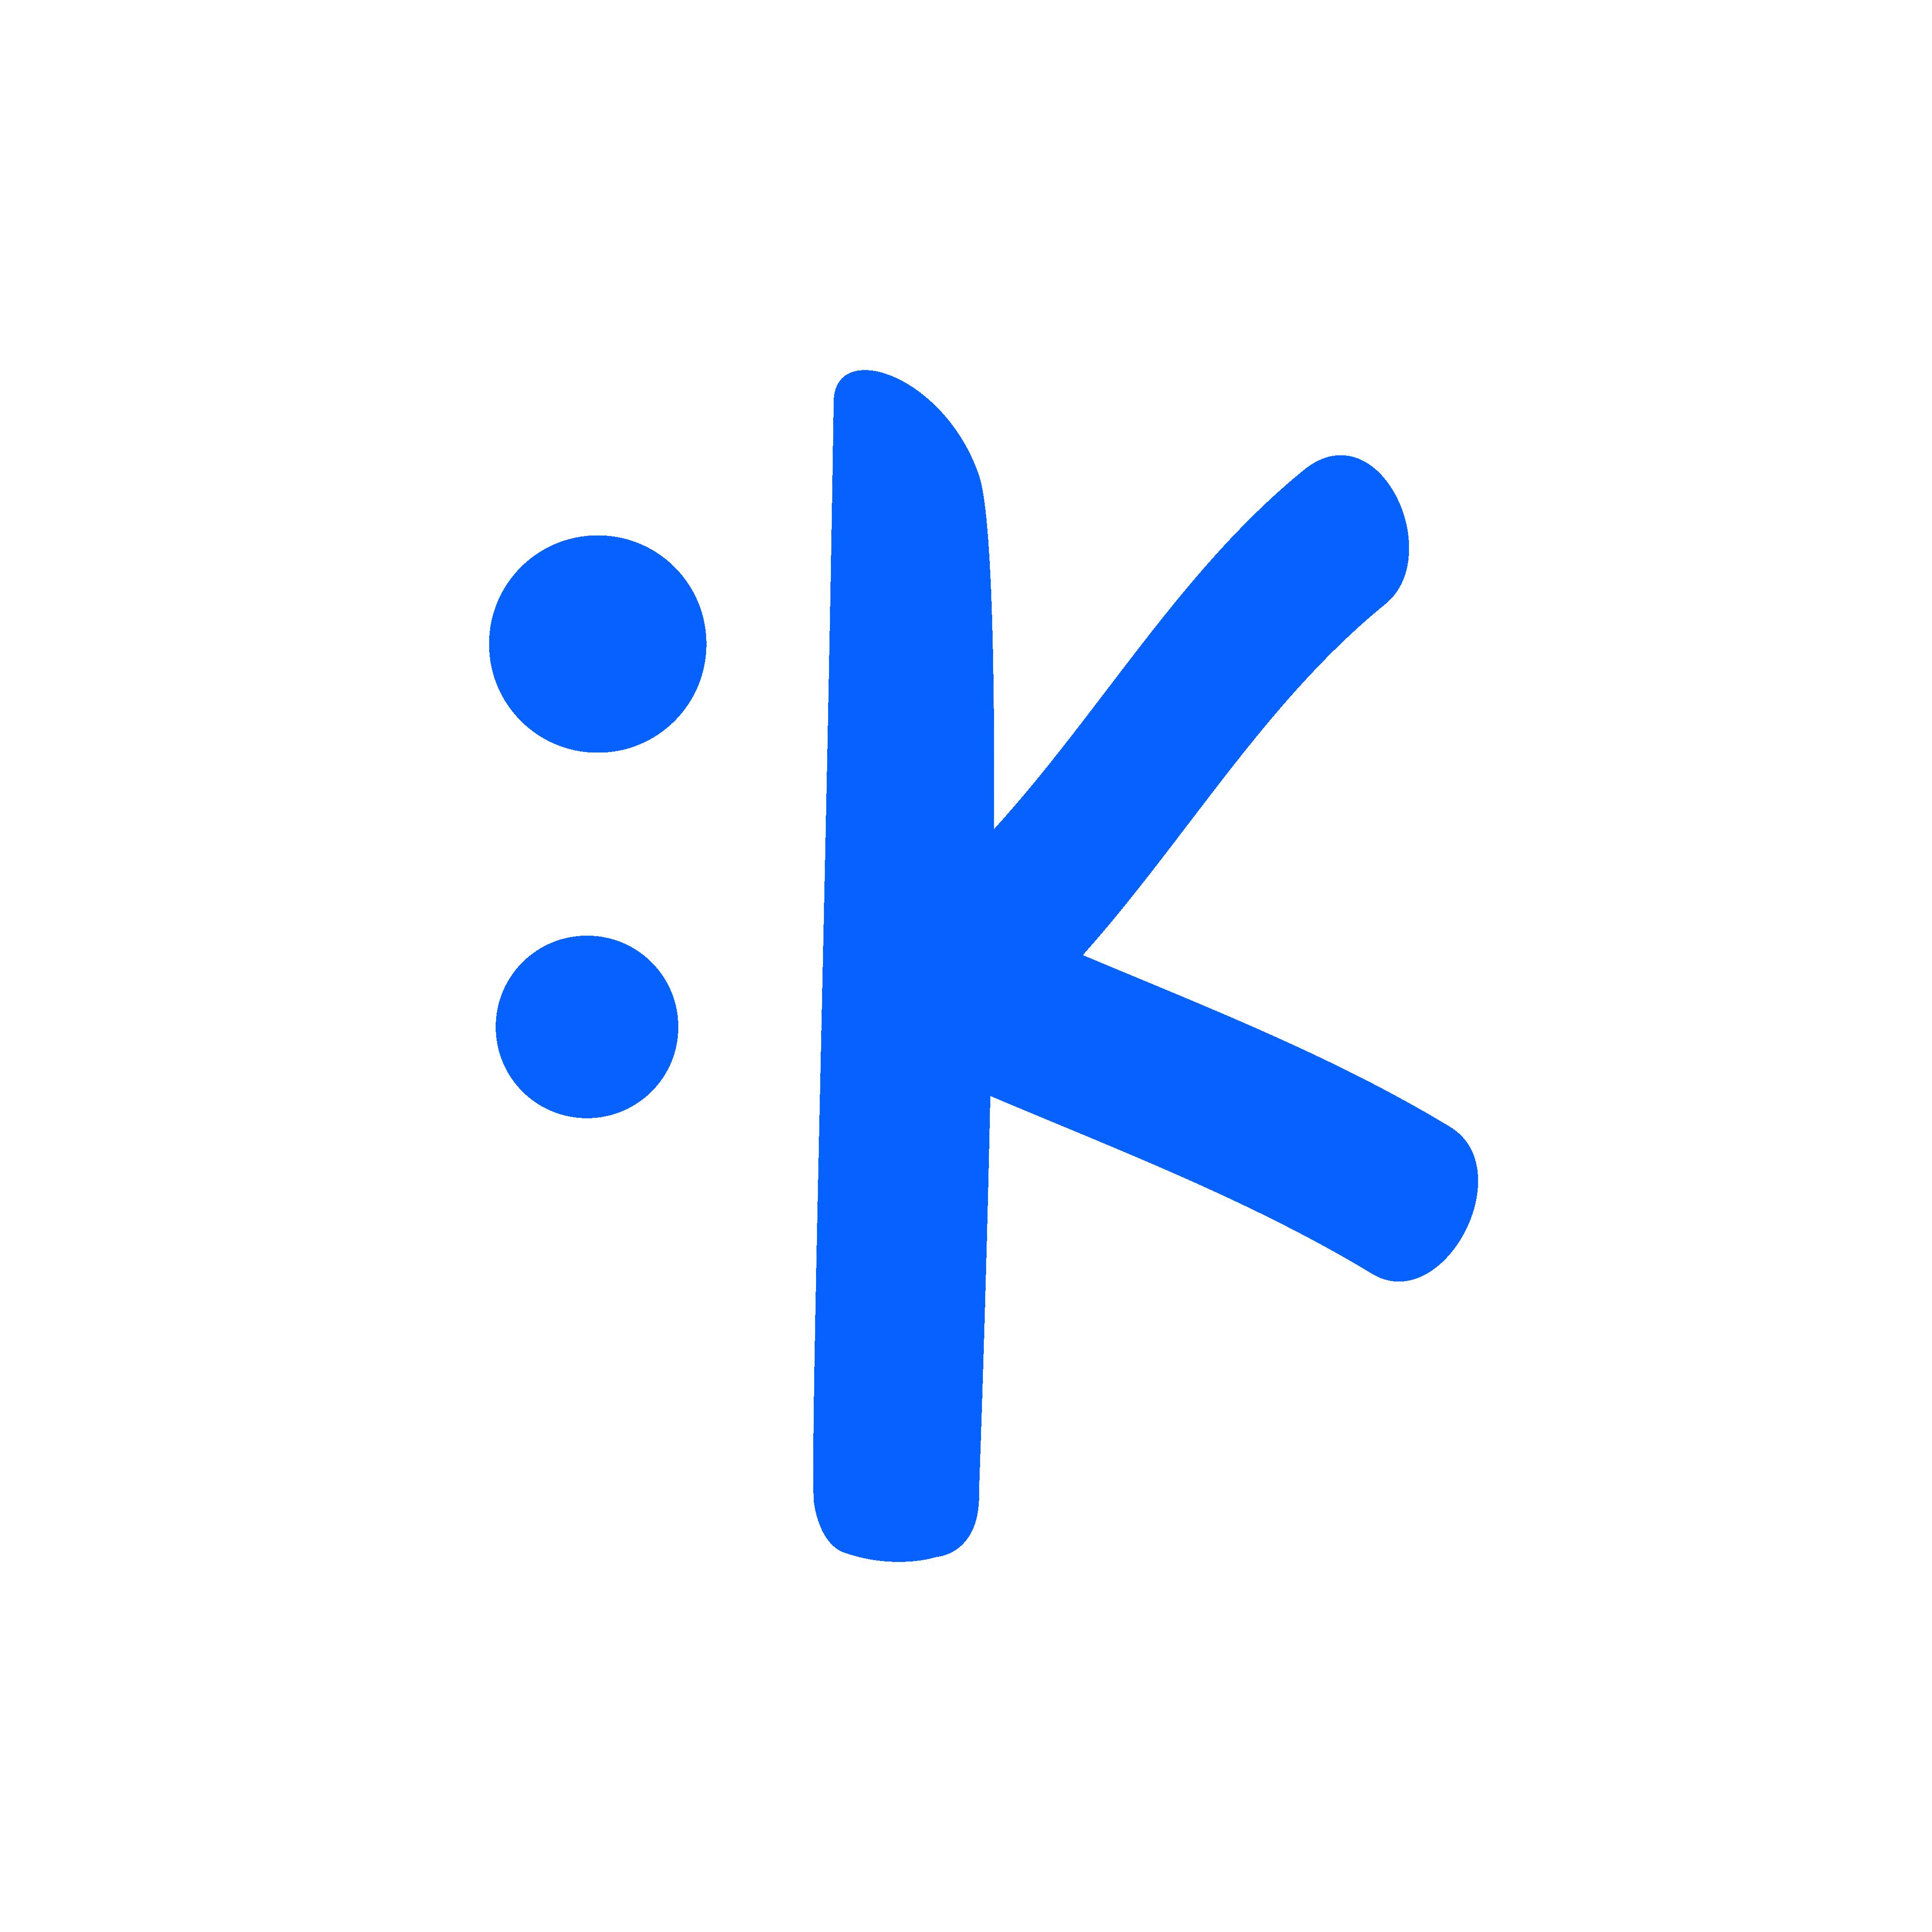 logo-ZEK-bleu